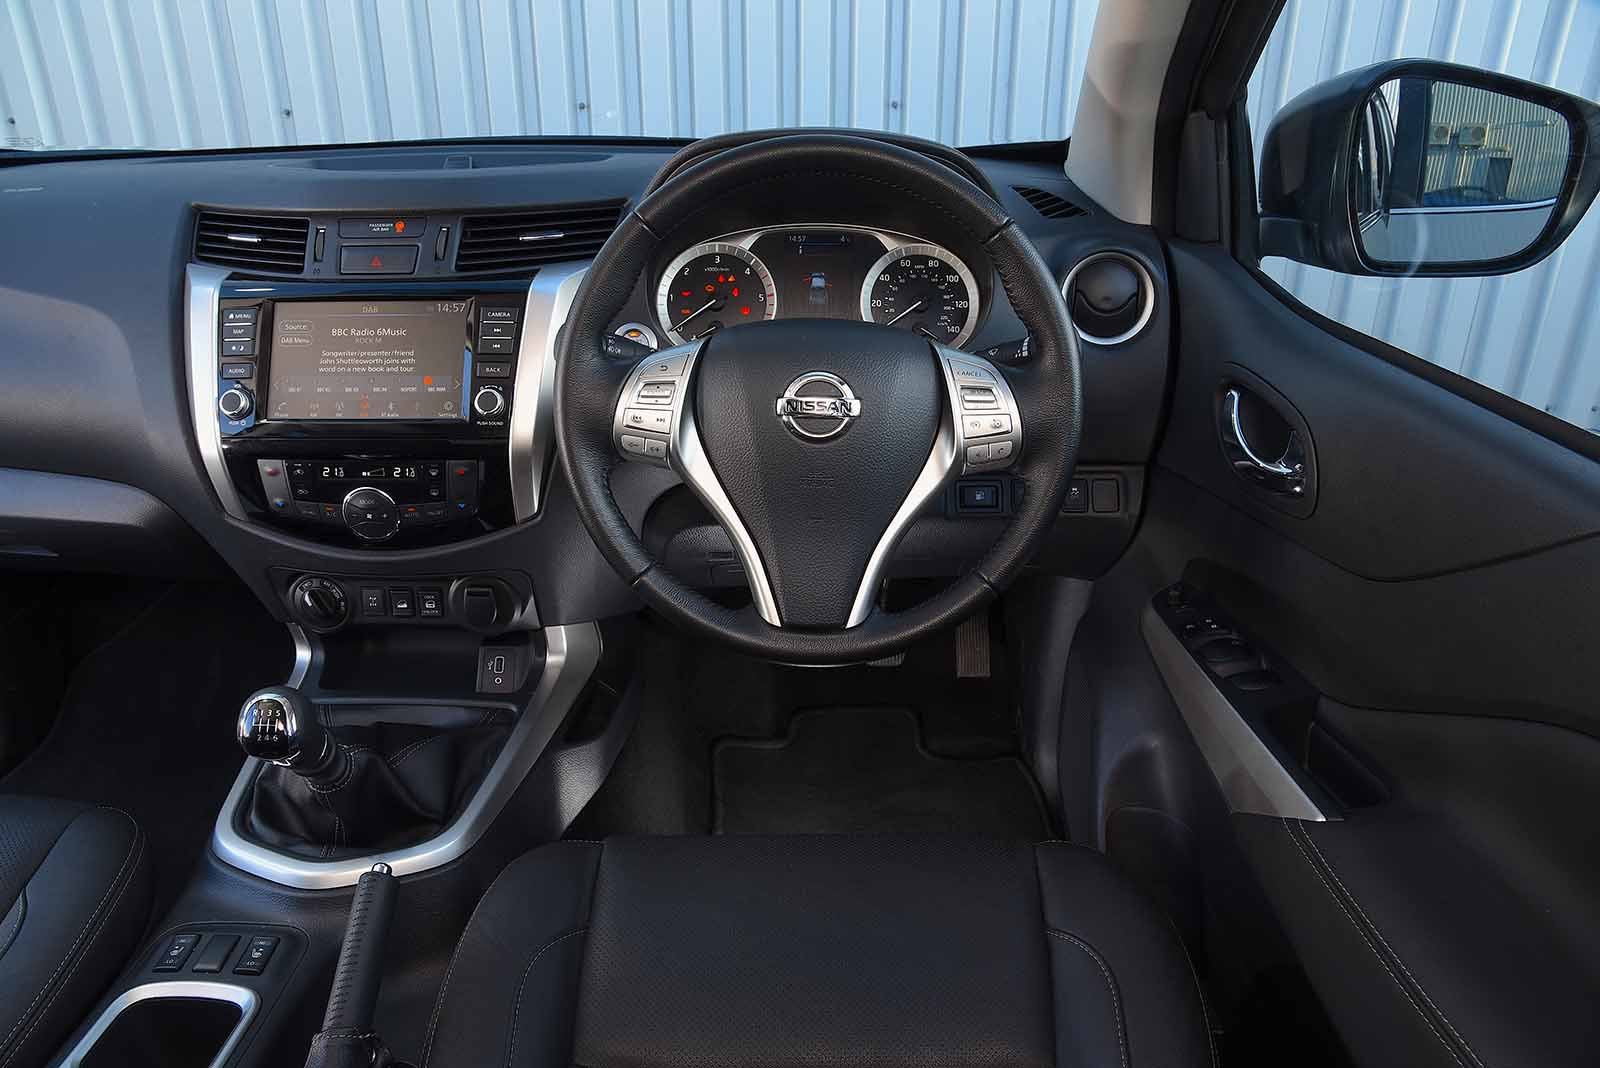 Nissan Navara 2020 RHD dashboard